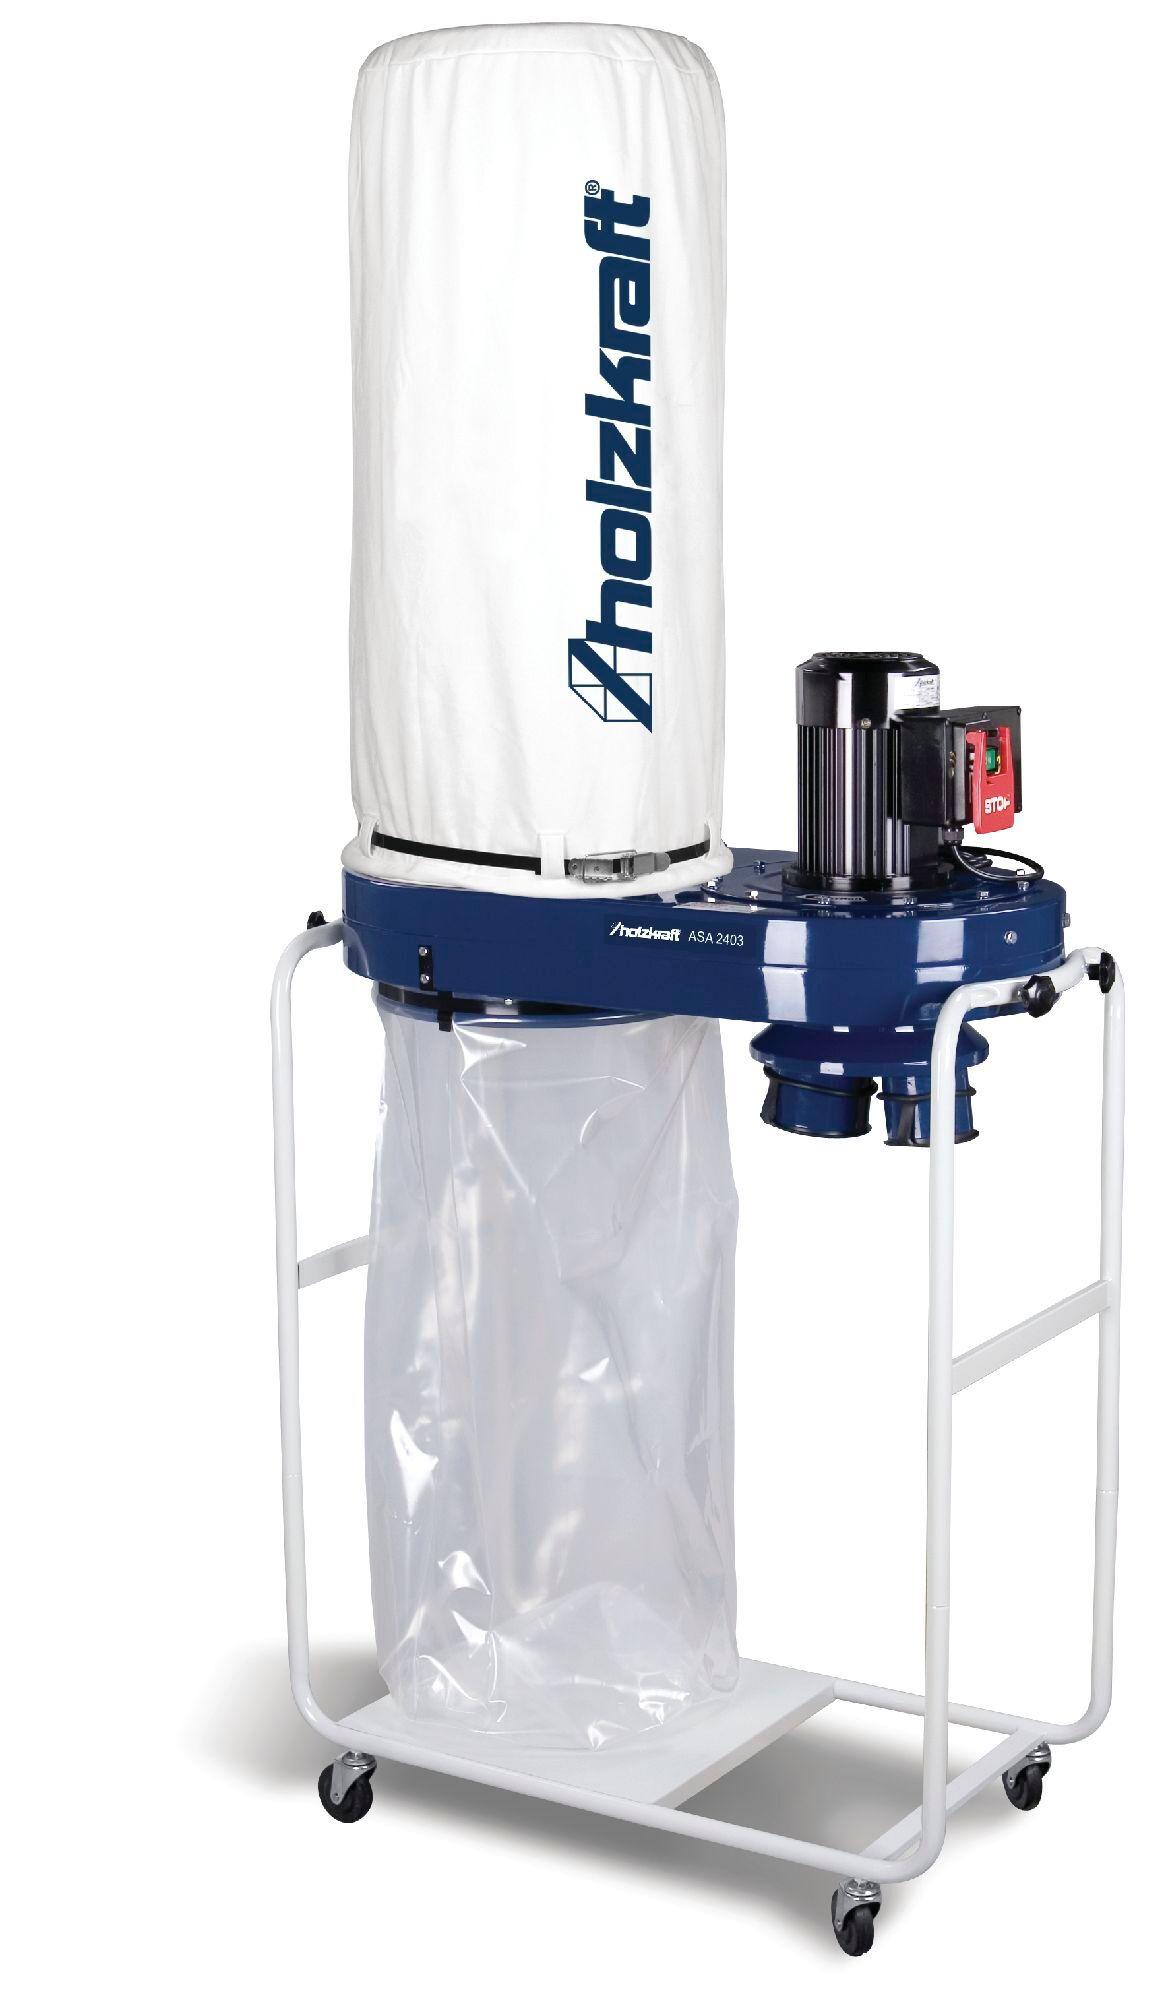 Holzkraft Aspirateur à copeaux 2789 m³/h 1,1 kW 3x400V Holzkraft ASA2403